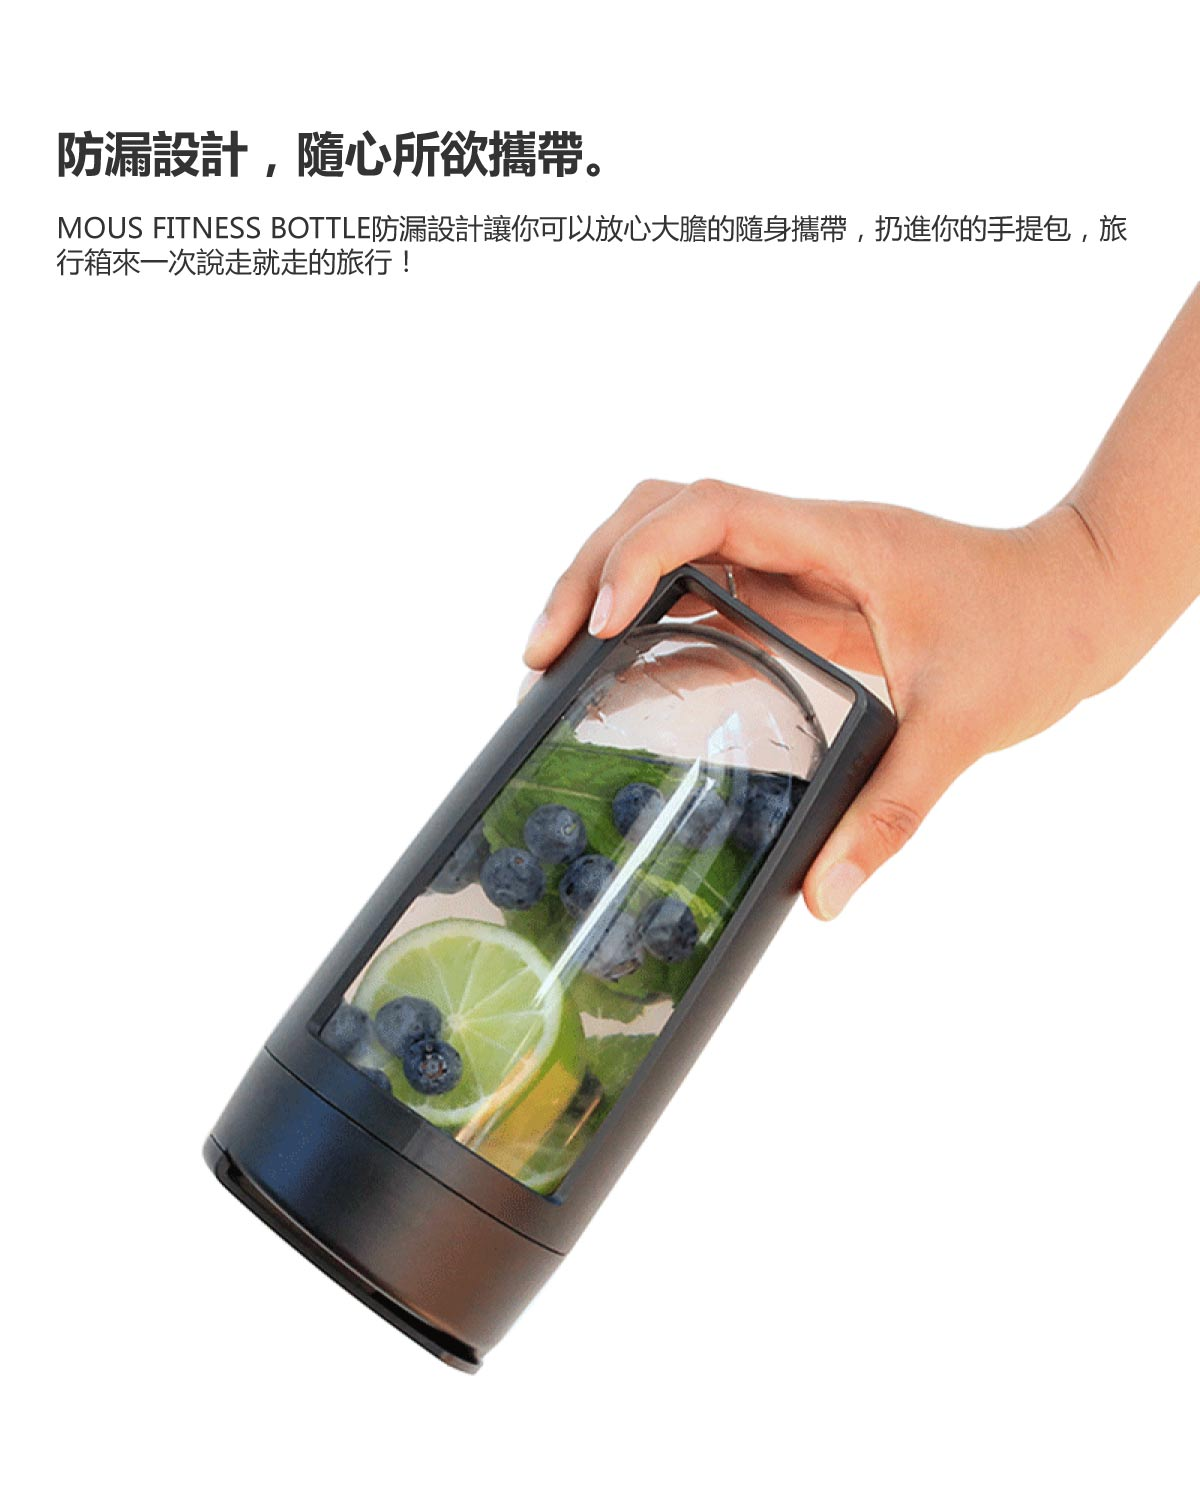 MOUS FITNESS的防漏設計可置放於手提包中而不會外露